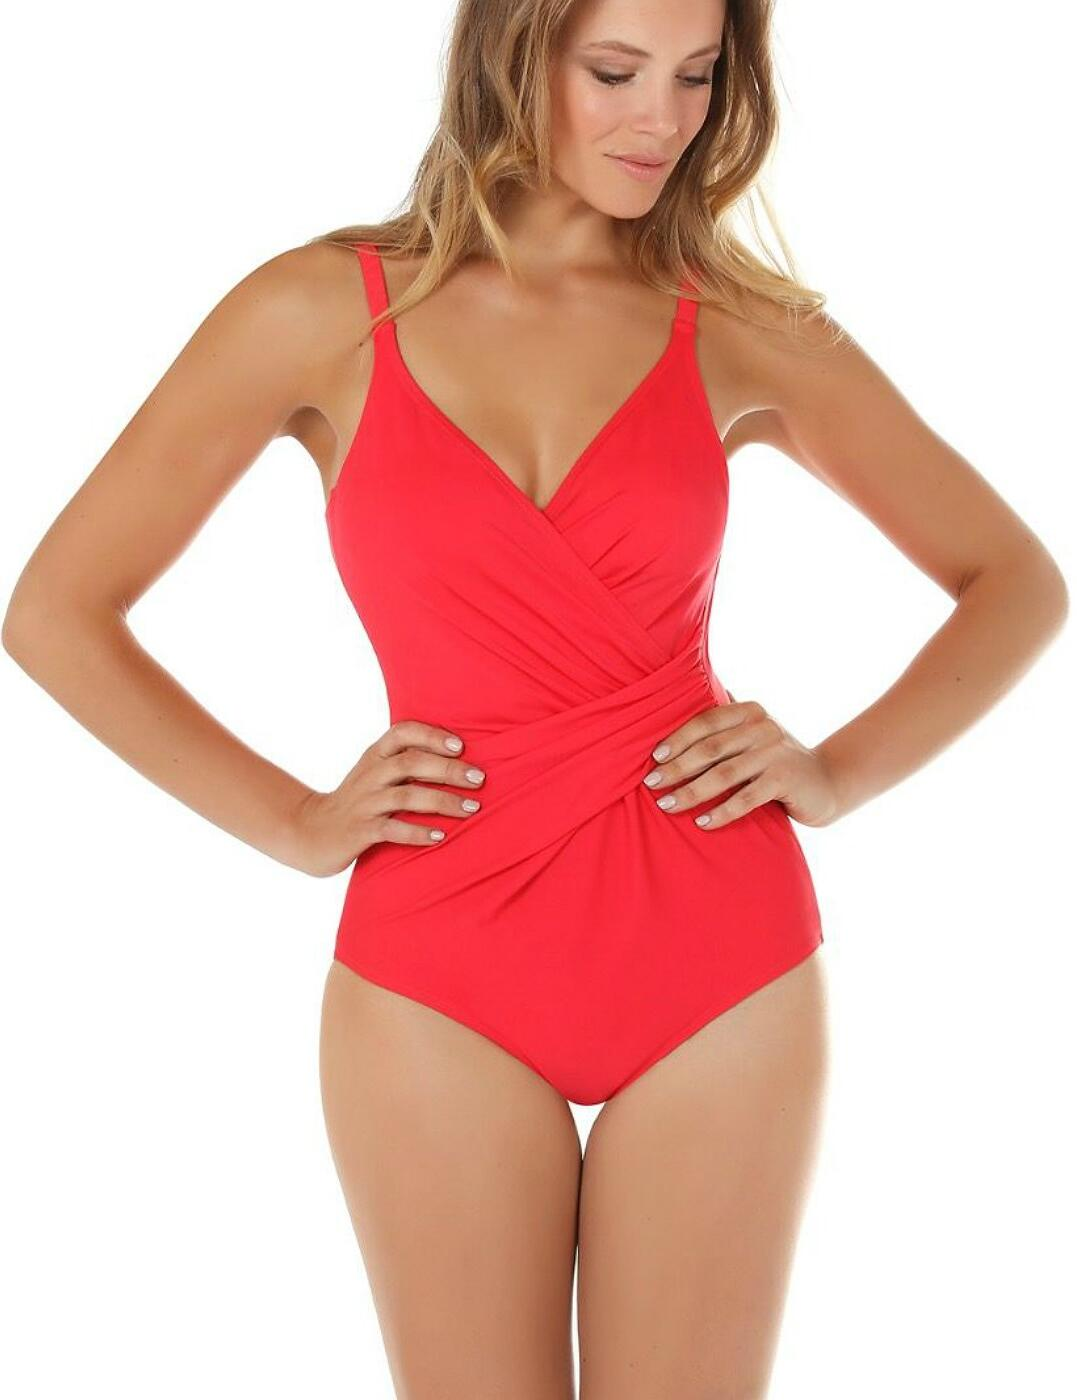 33-2184 SeaSpray Just Colour Plain Draped Swimsuit - 33-2184 Coral